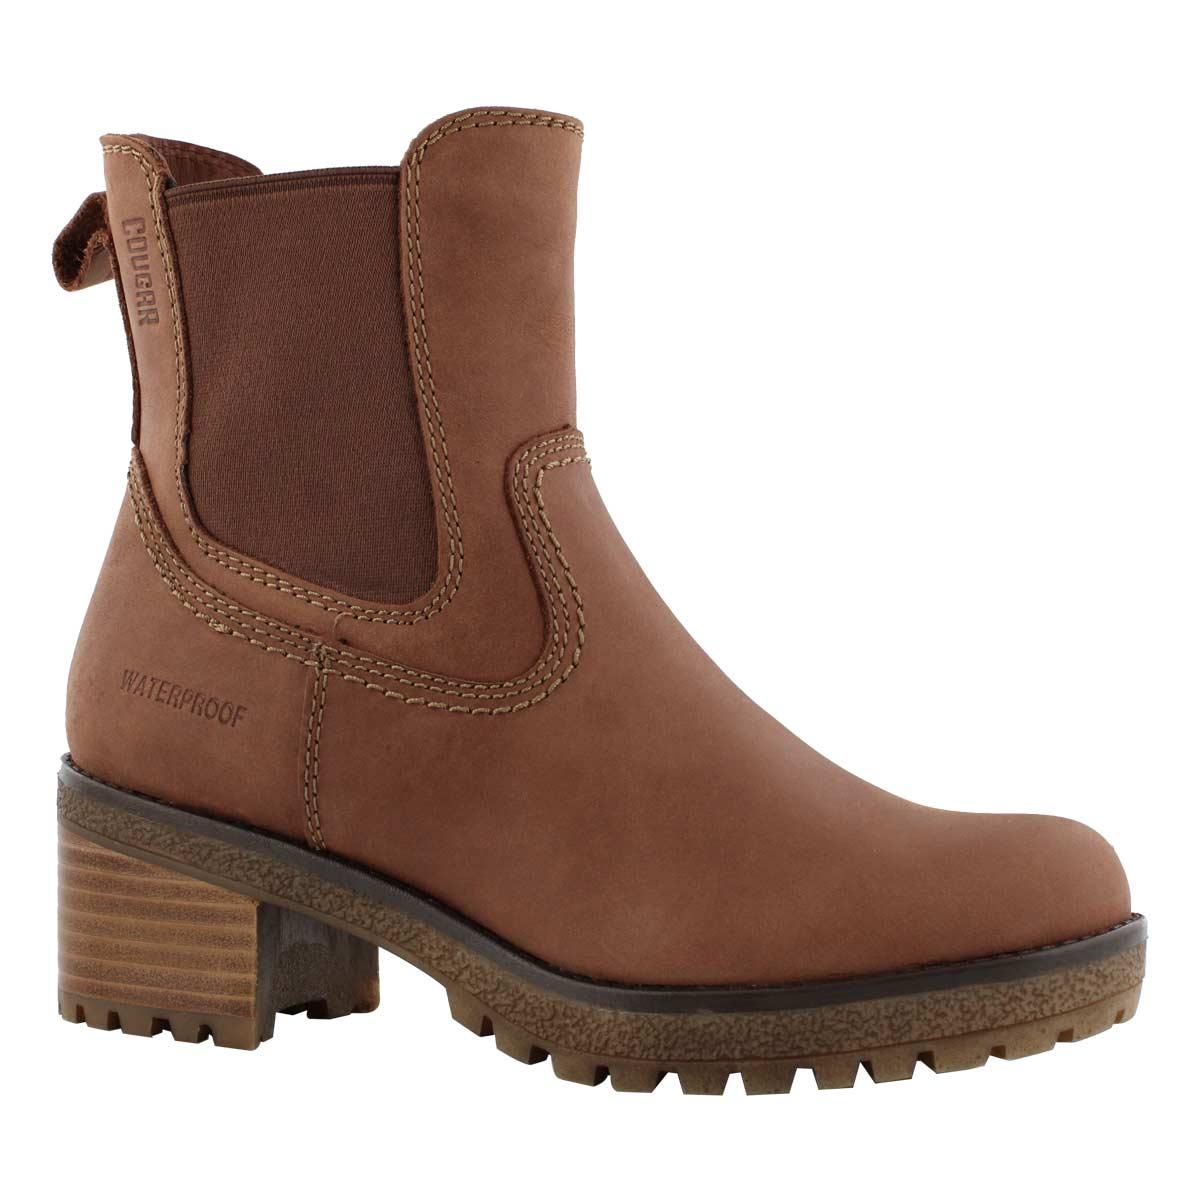 Lds Dallas brn wtpf slip on winter boot